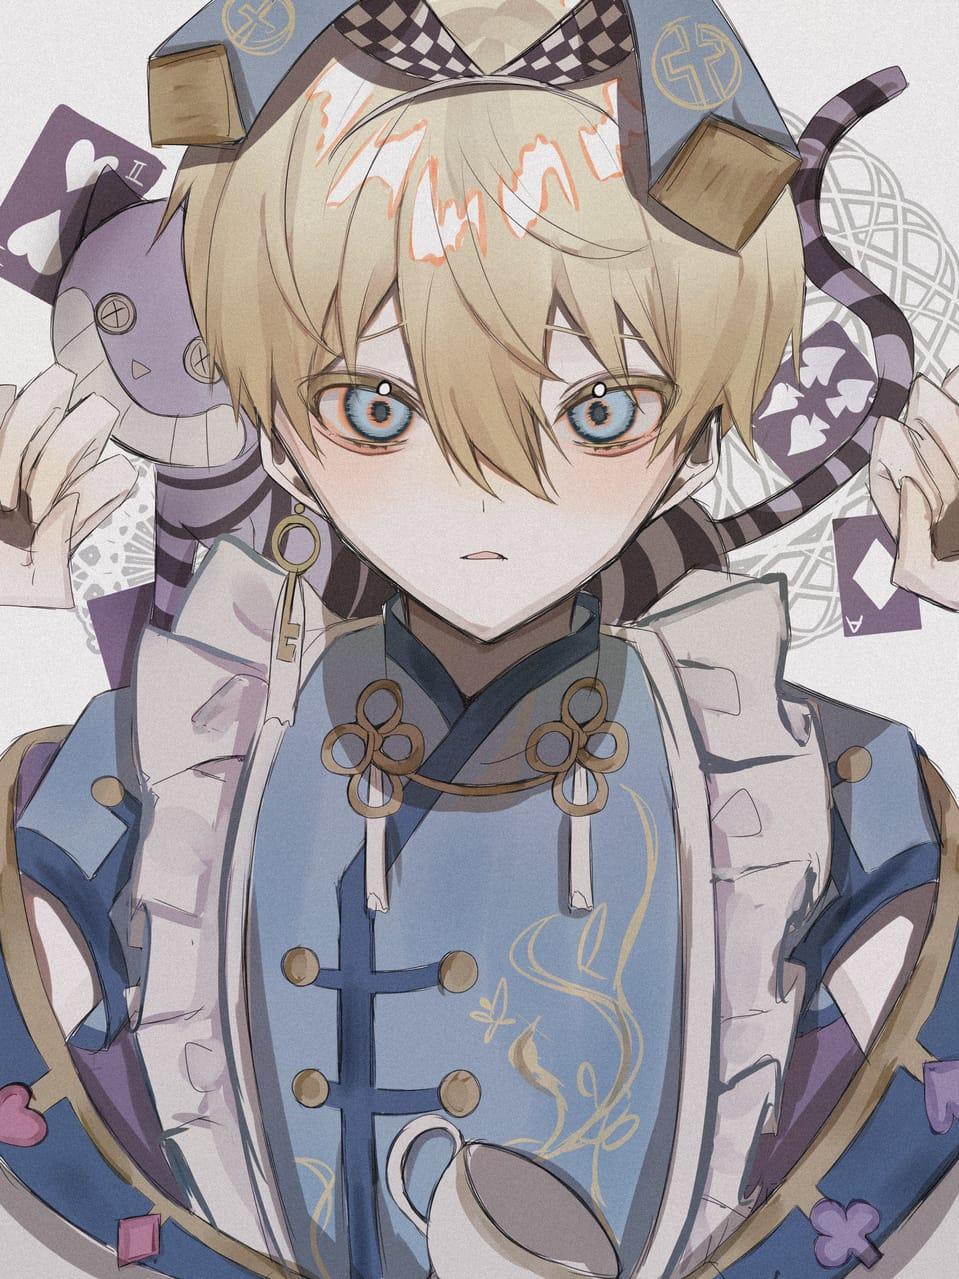 Illust of つぶ February2021_Fantasy oc original Medibang boy